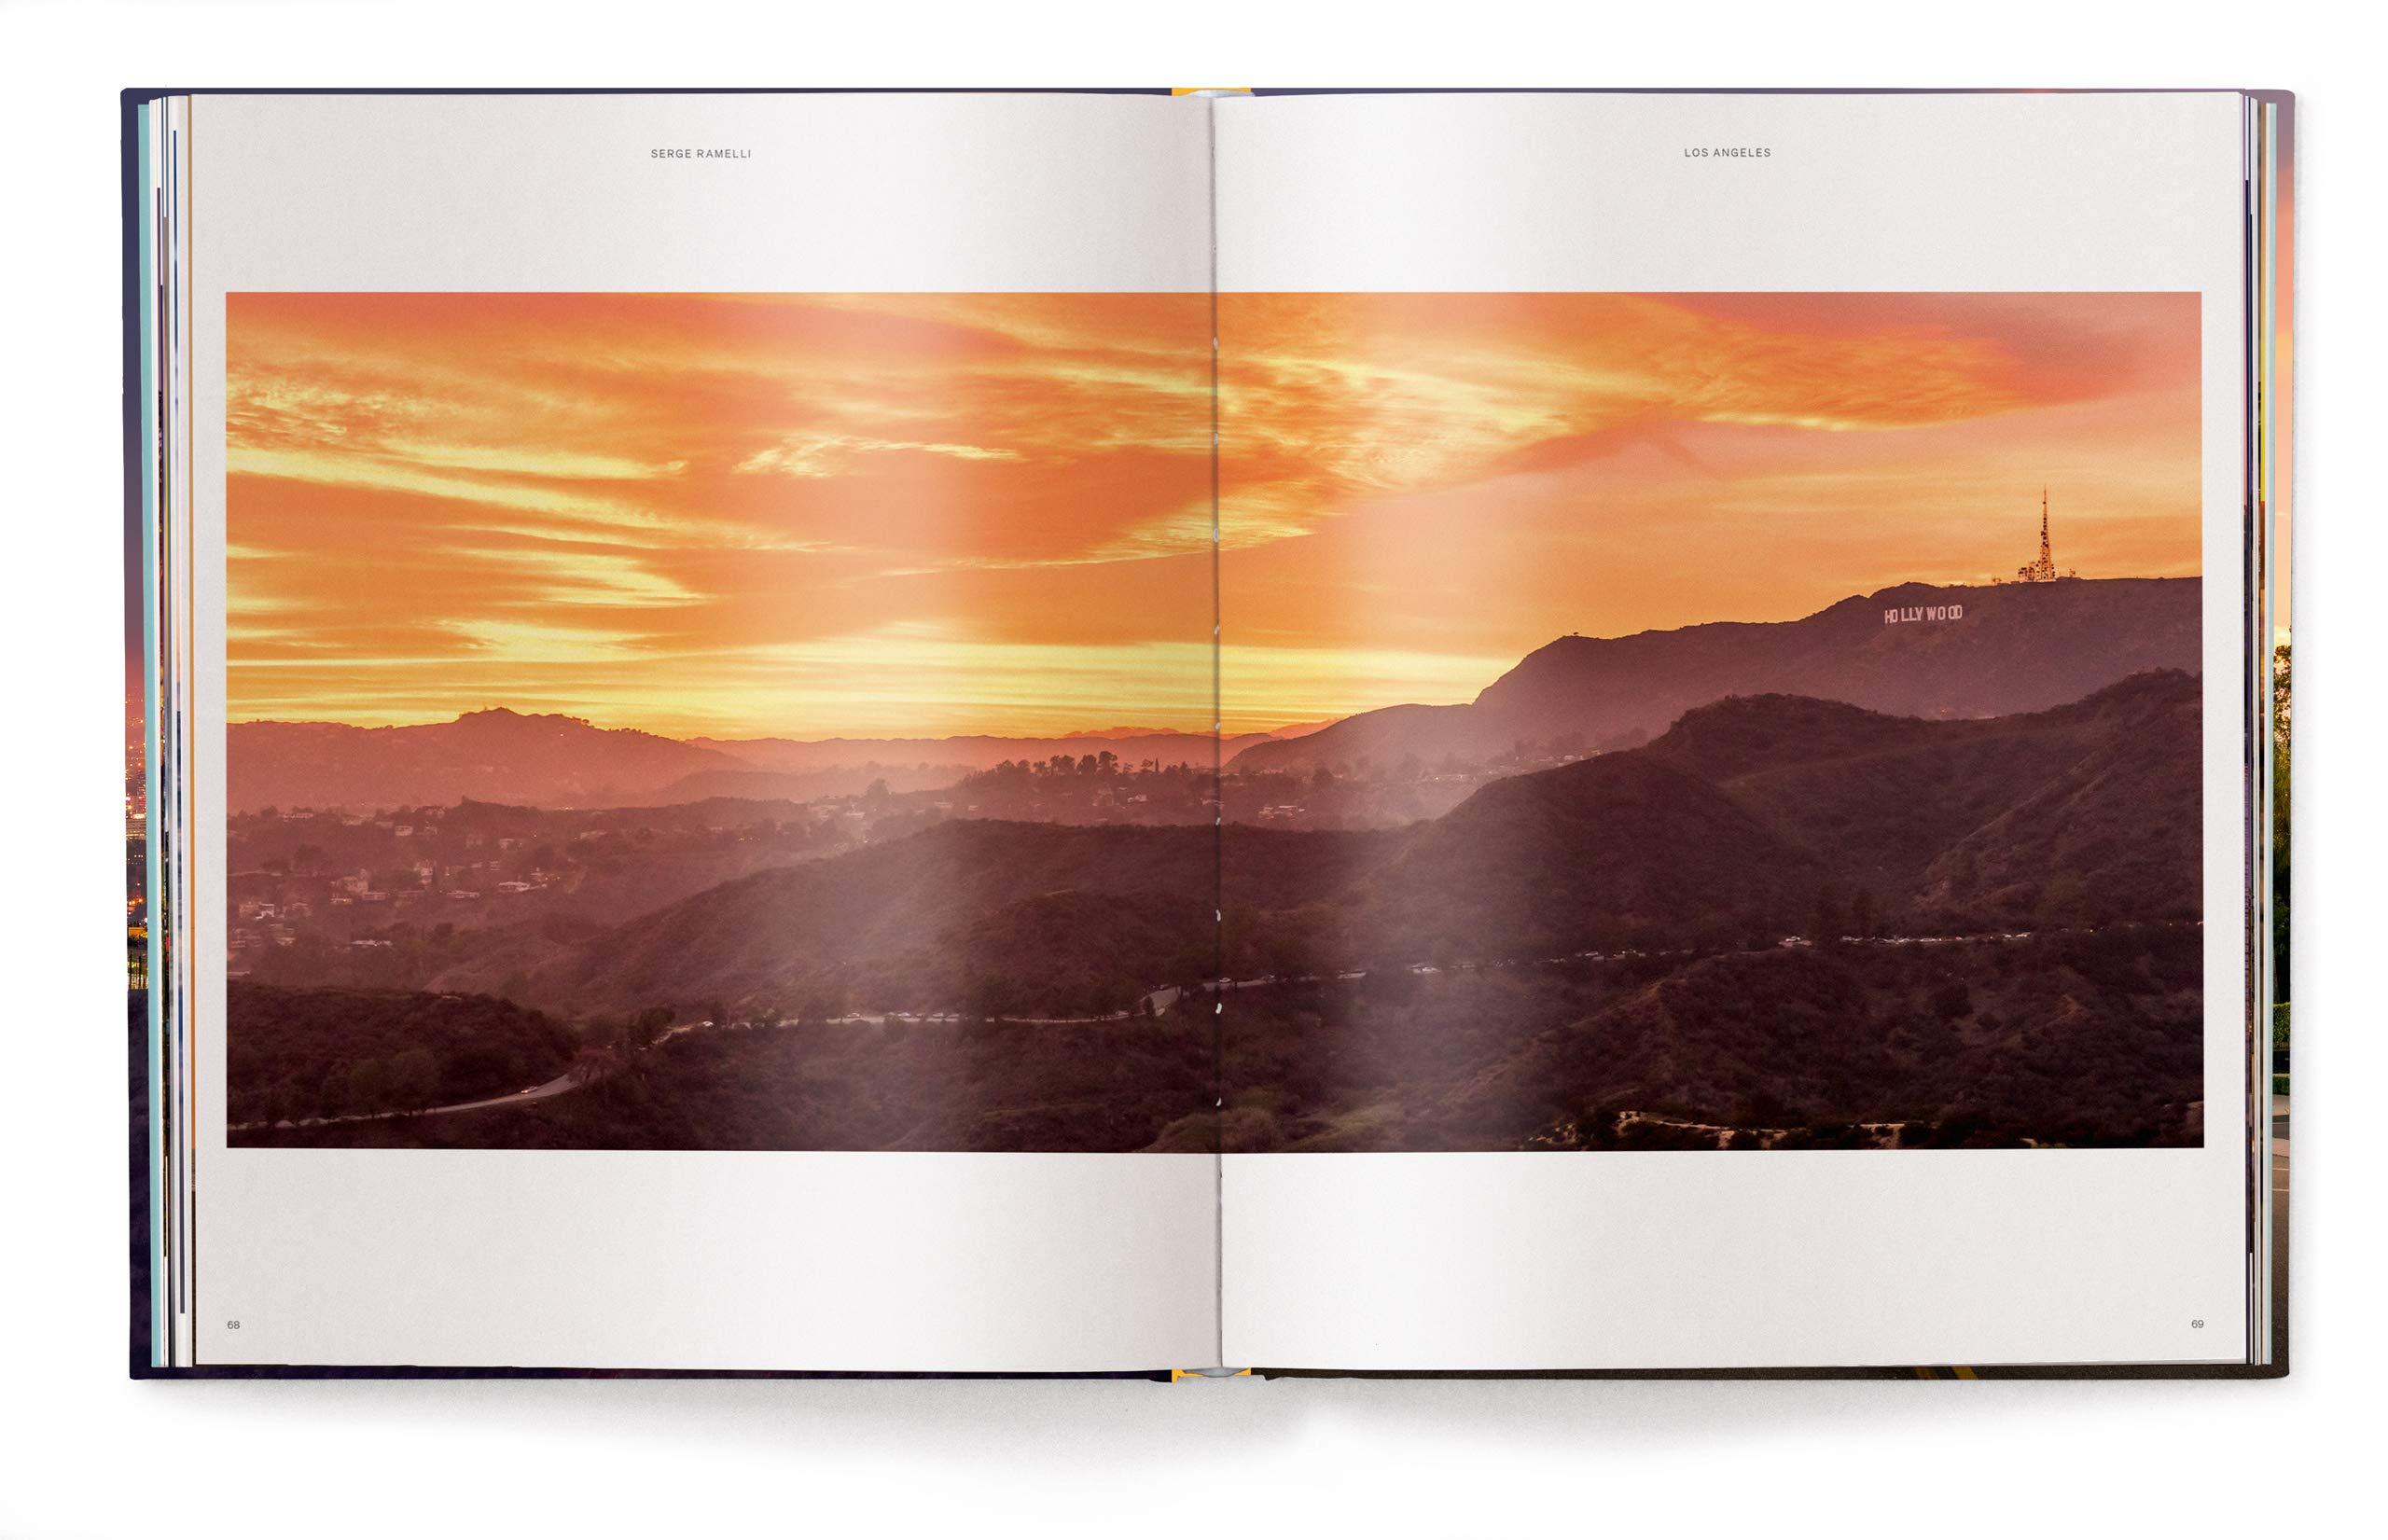 Los Ángeles (L.A.) - Página 2 81ET5G9wsXL